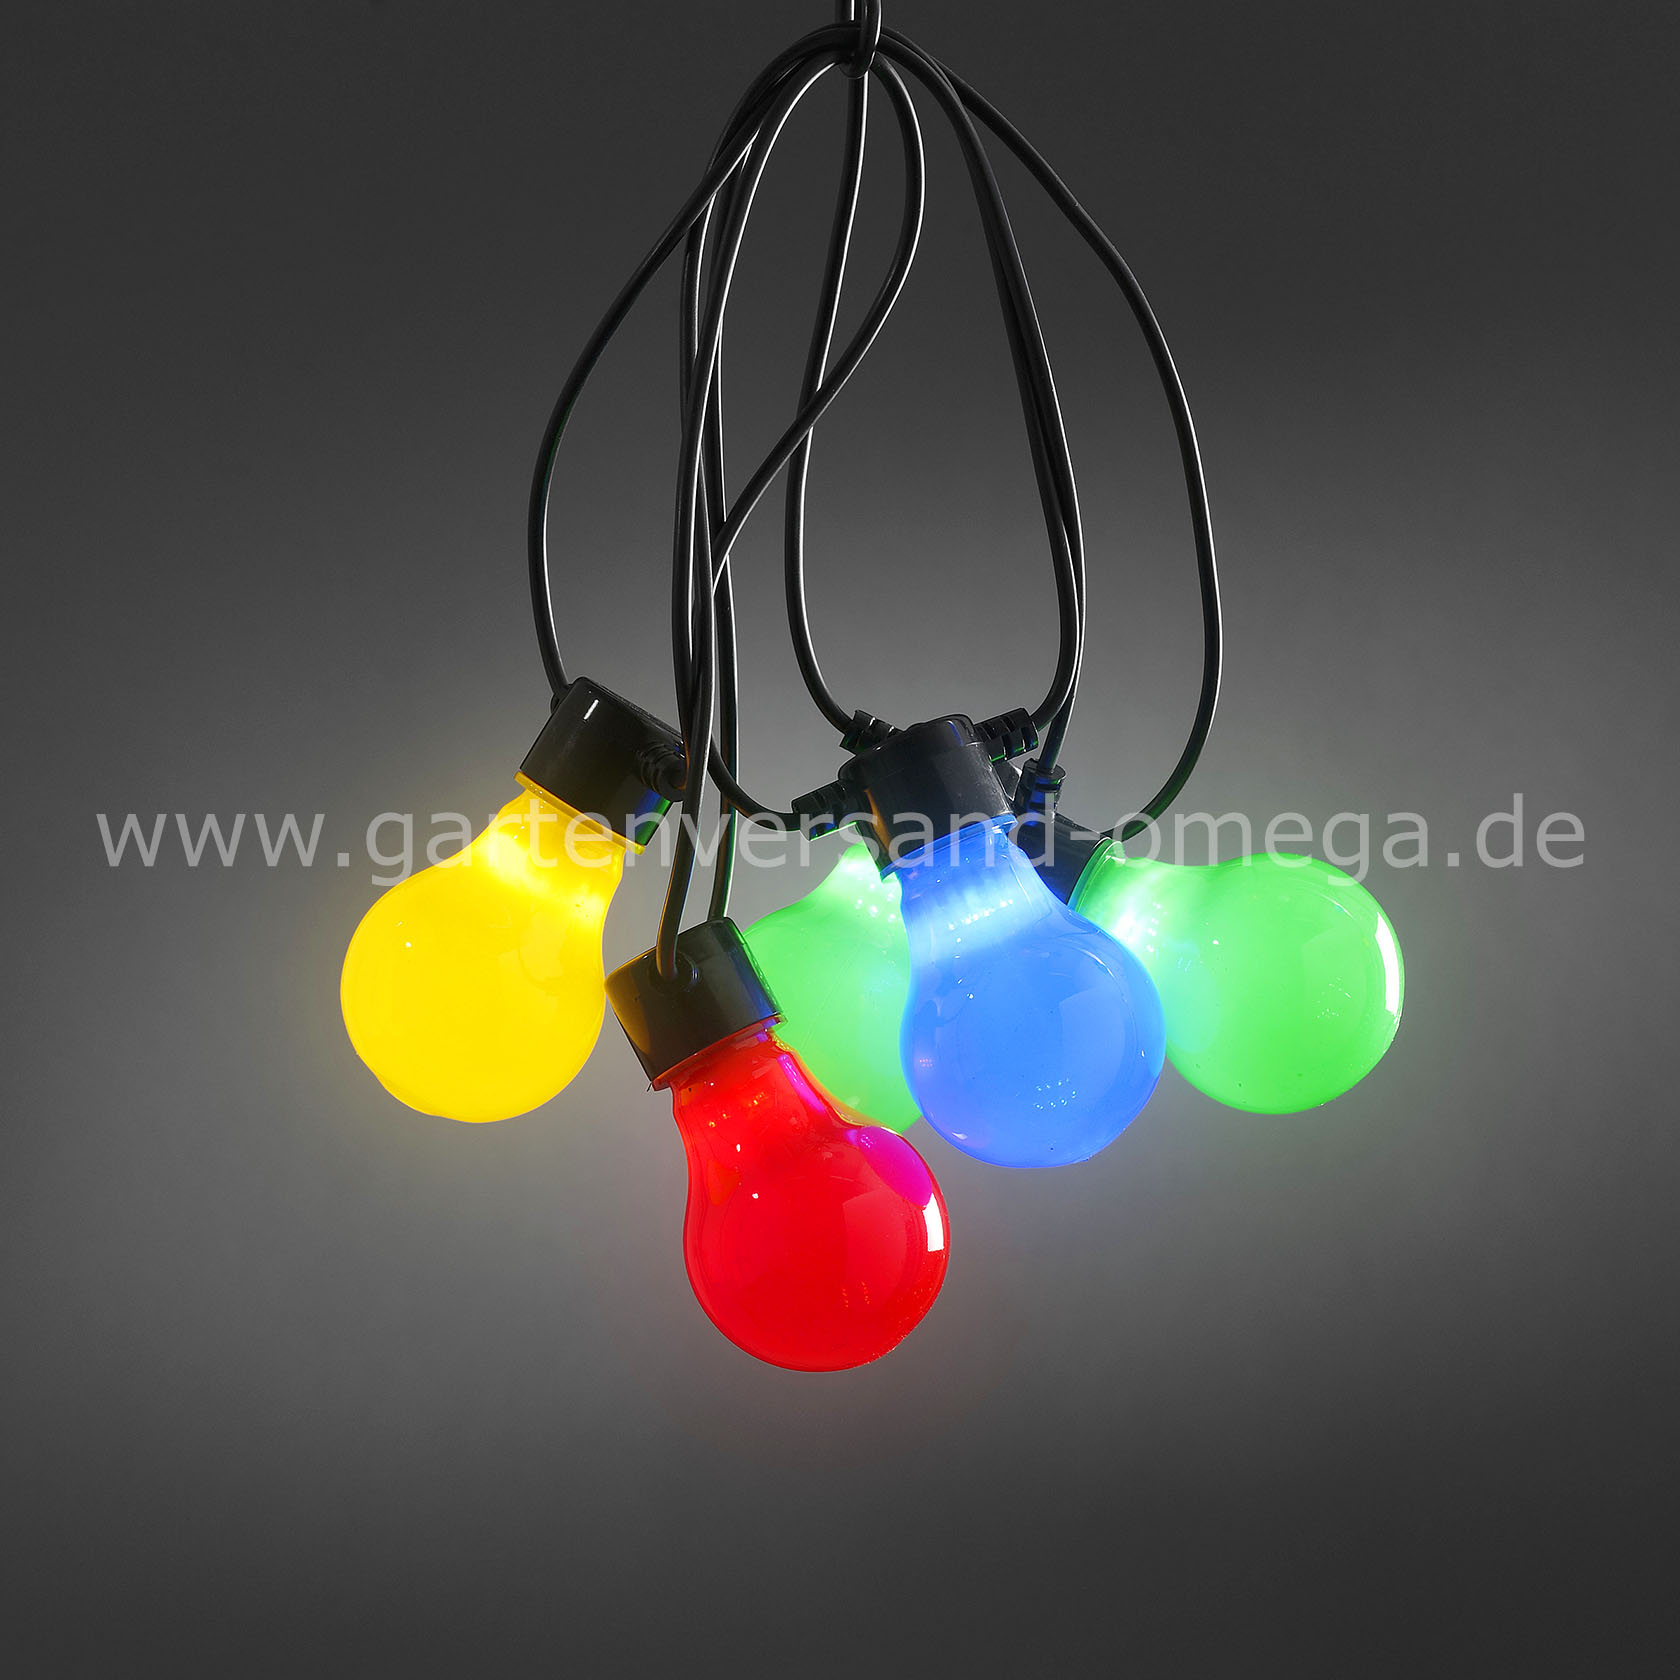 led biergartenlichterkette biergartenbeleuchtung partylichterkette partybeleuchtung. Black Bedroom Furniture Sets. Home Design Ideas